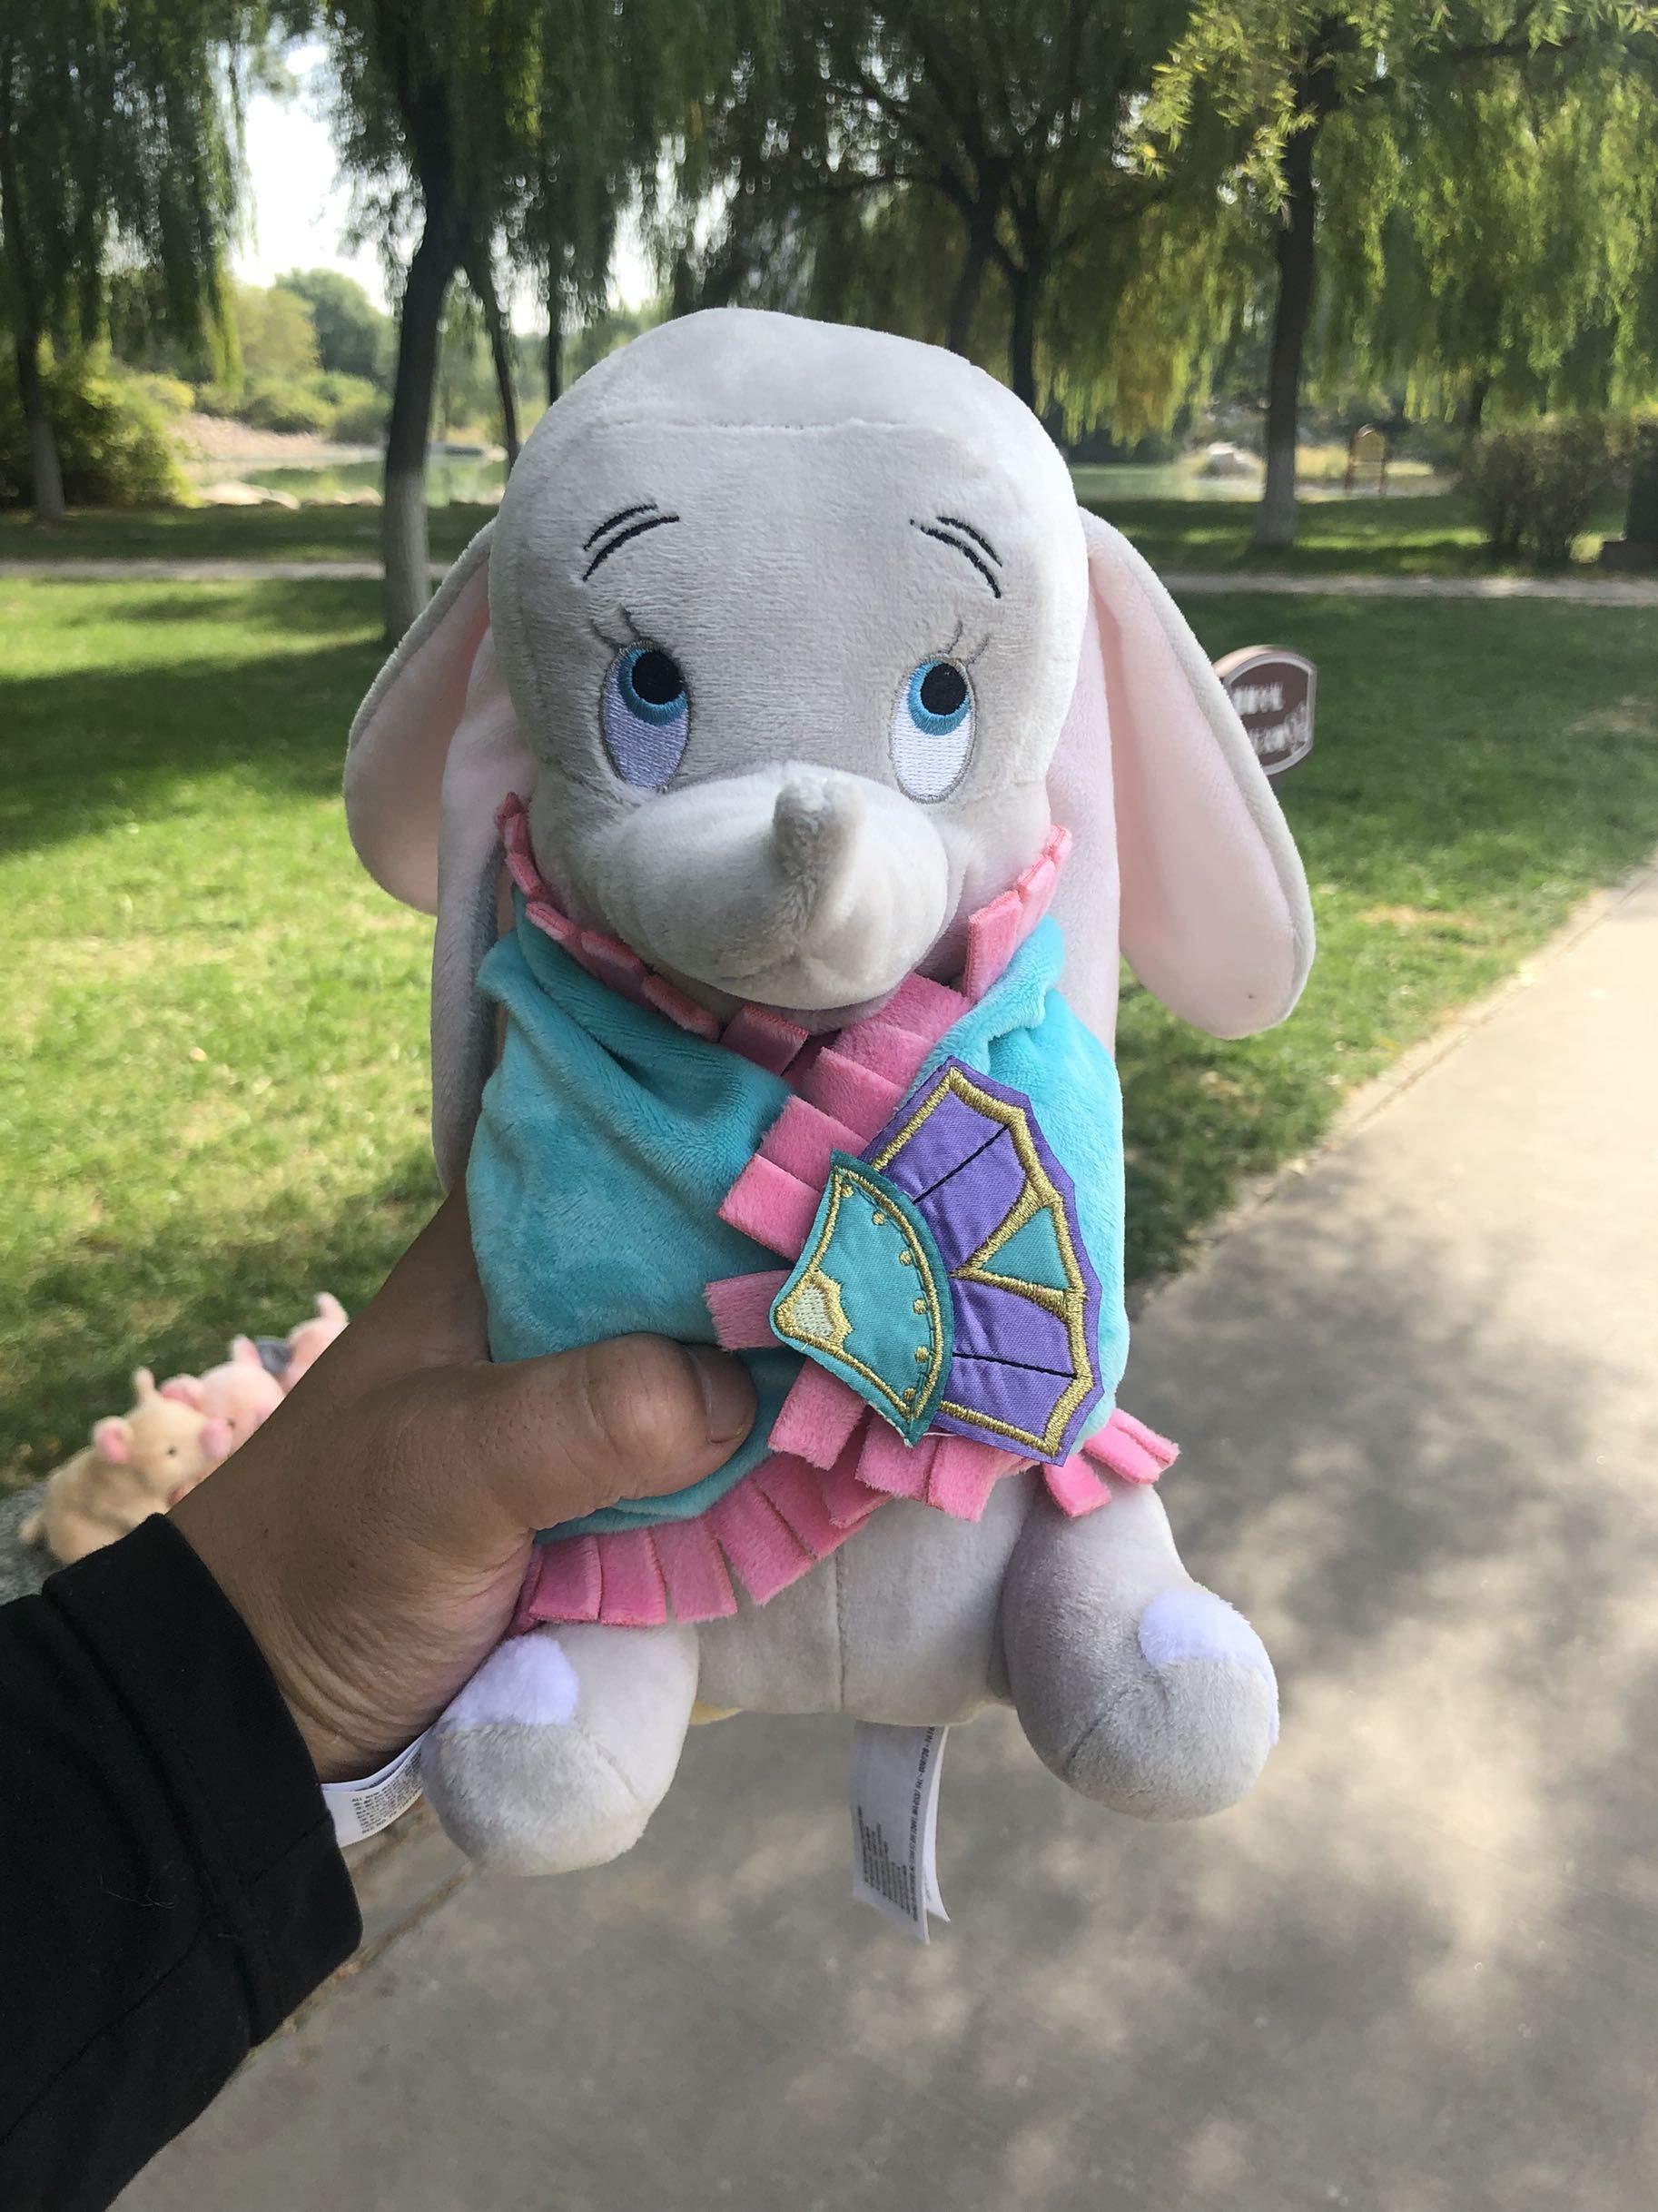 Cute Dumbo Baby Swaddle Elephant Stuff Animal Plush Toy Doll, Baby Kids Toys Regalo De Cumpleaños, para Recién Nacido Cute Animal Baby 21Cm